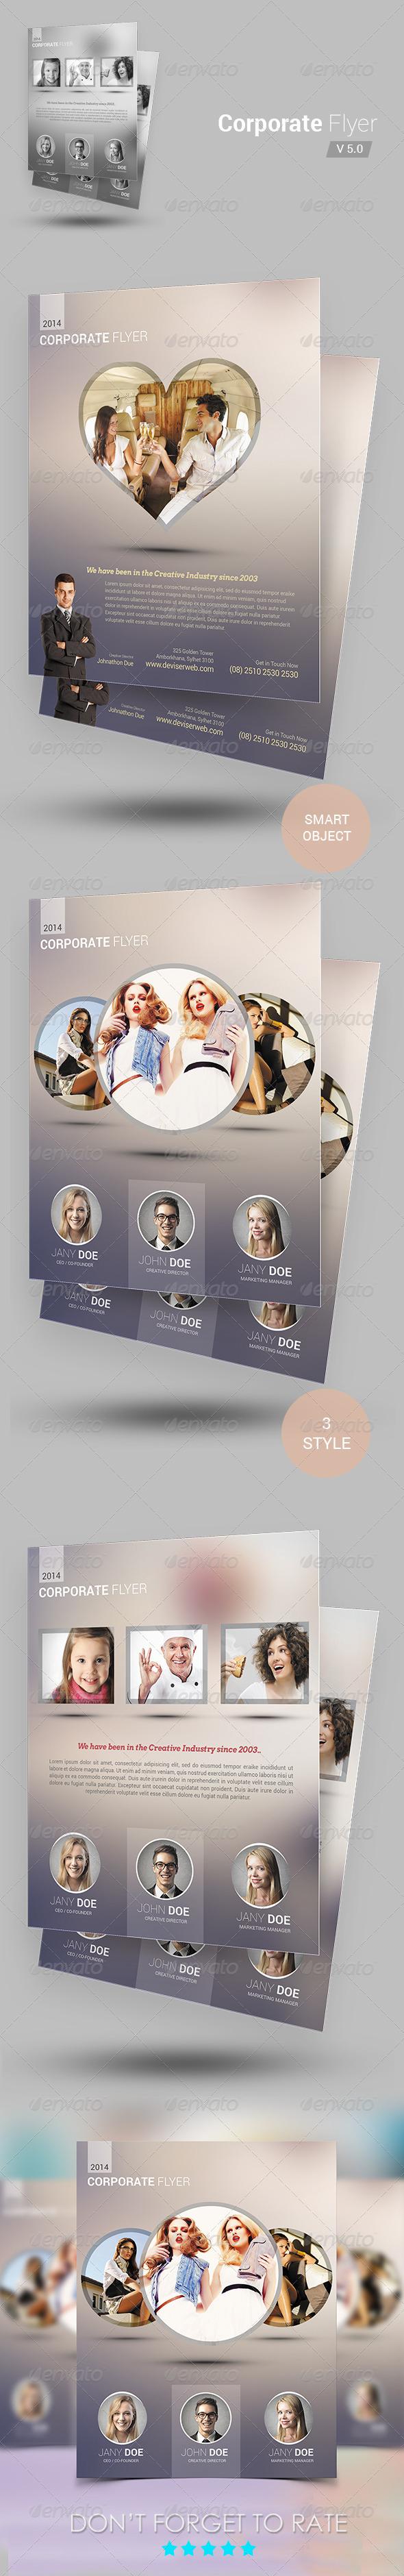 Creative Modern Agency Flyer - Corporate Flyers